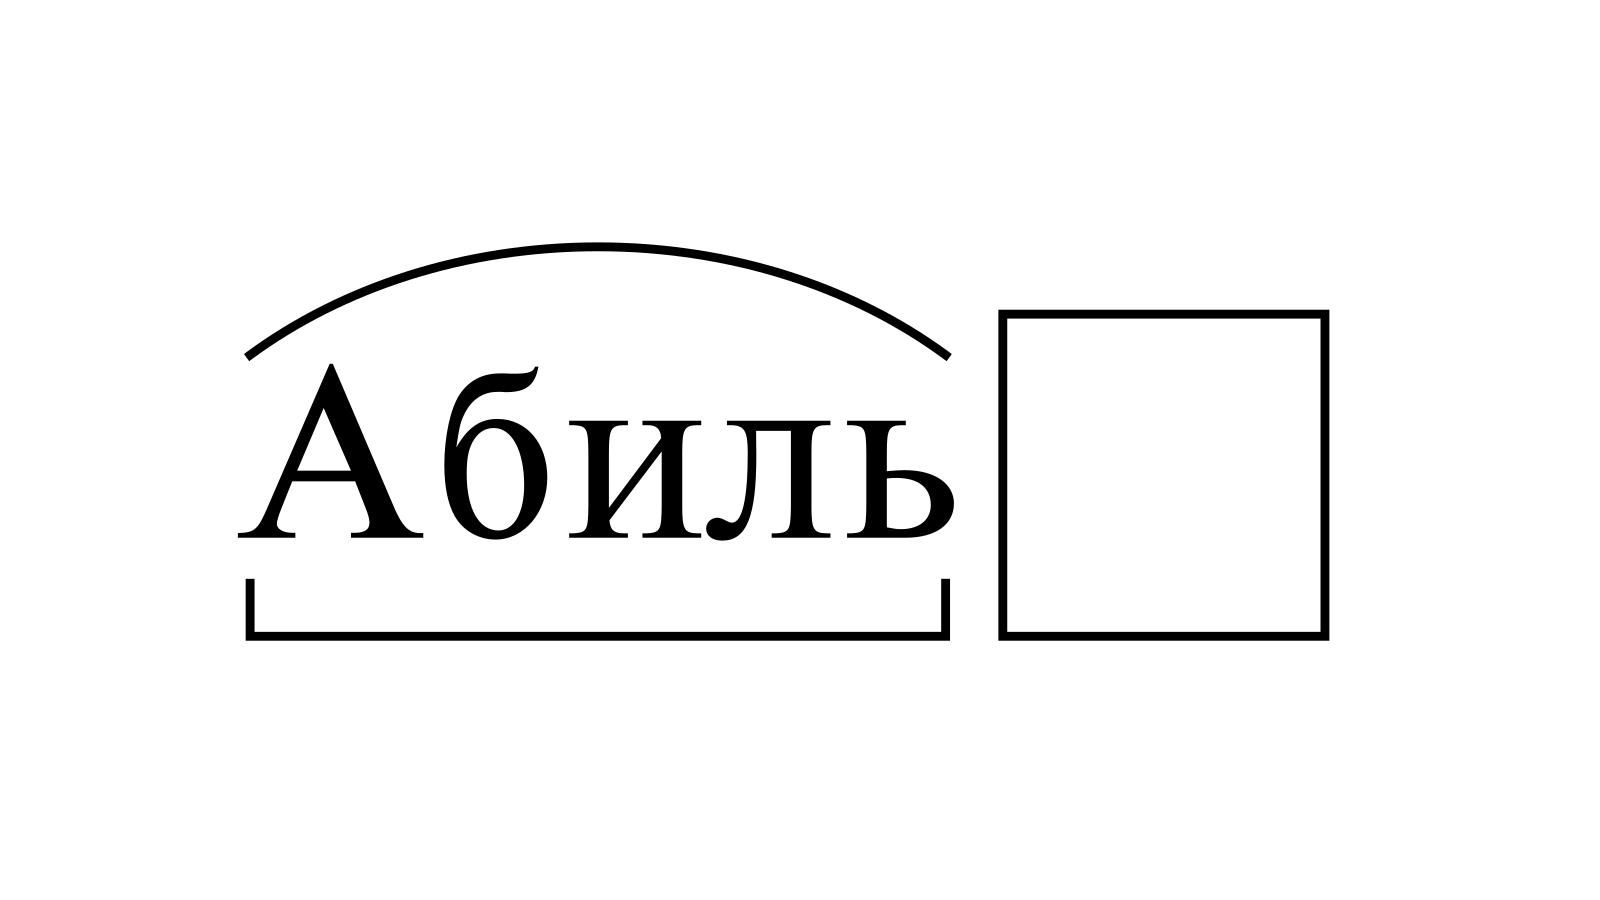 Разбор слова «Абиль» по составу